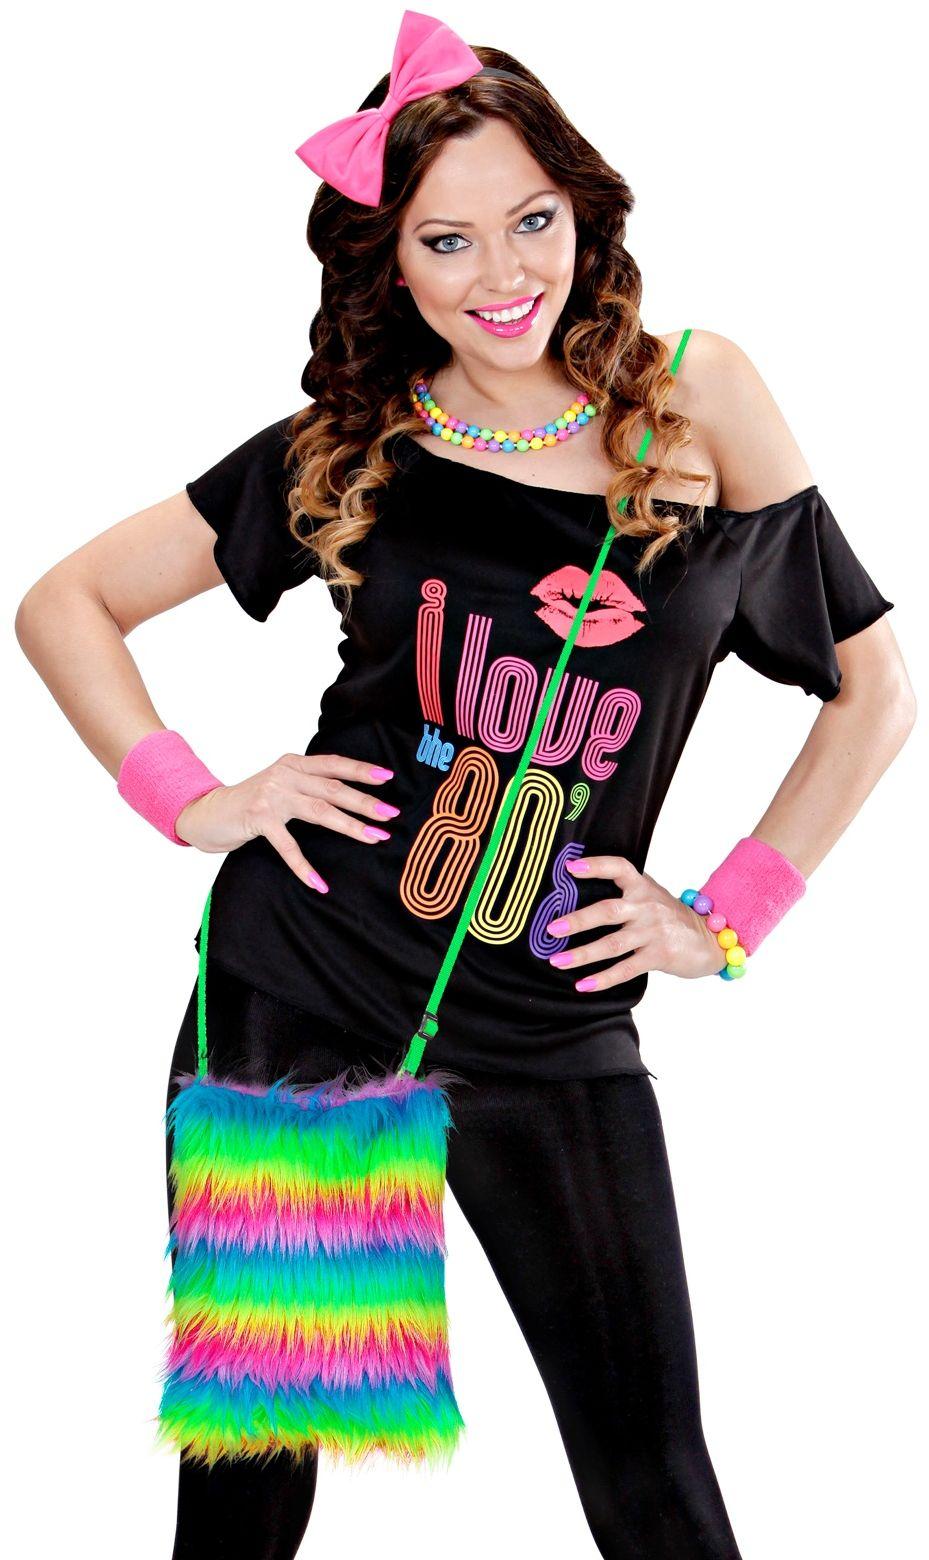 Regenboog carnaval schoudertasje